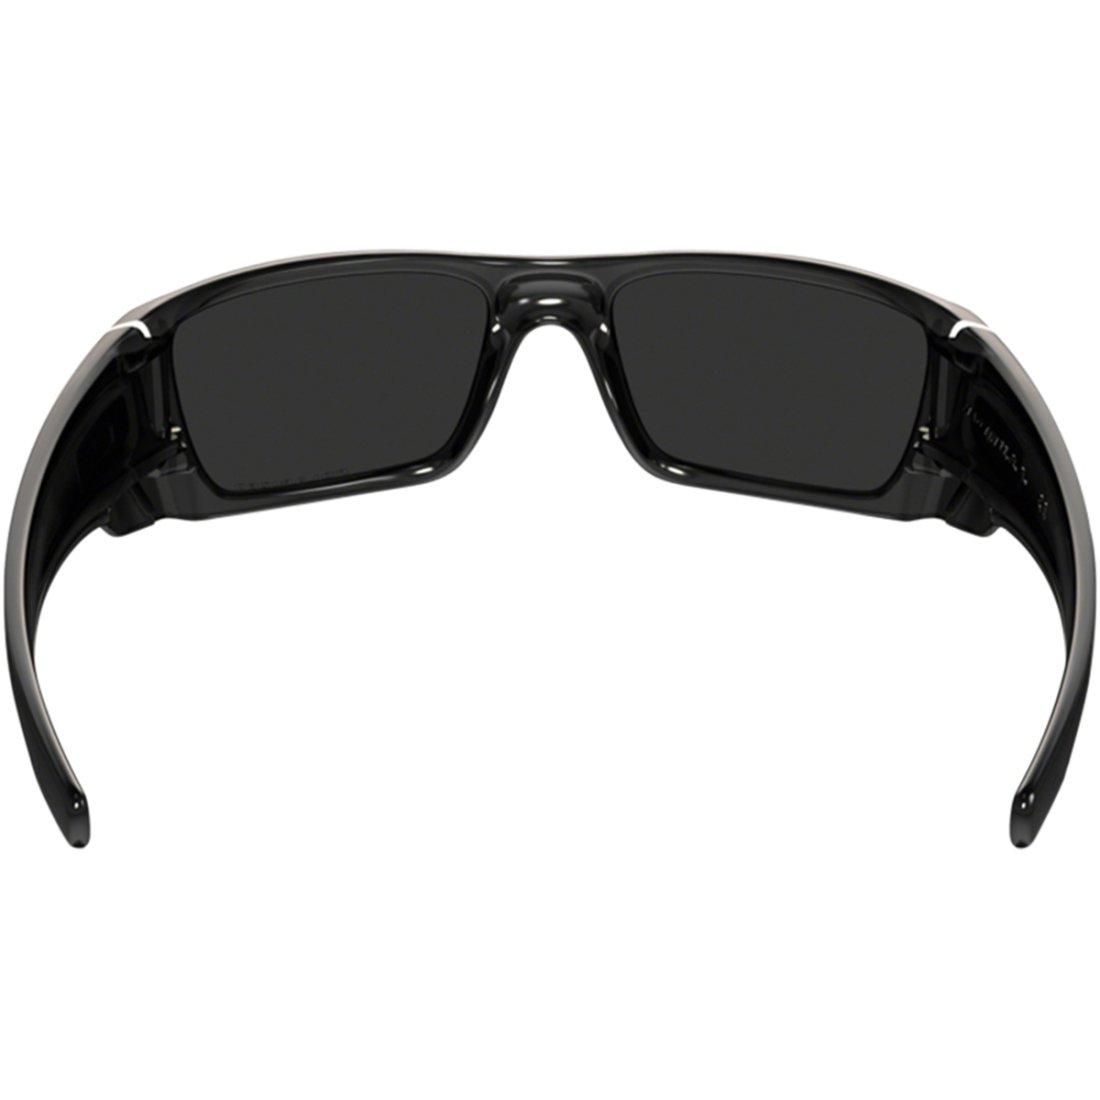 OAKLEY Fuel Cell Polished Black / Ice Iridium Polarized Sun glasses ...